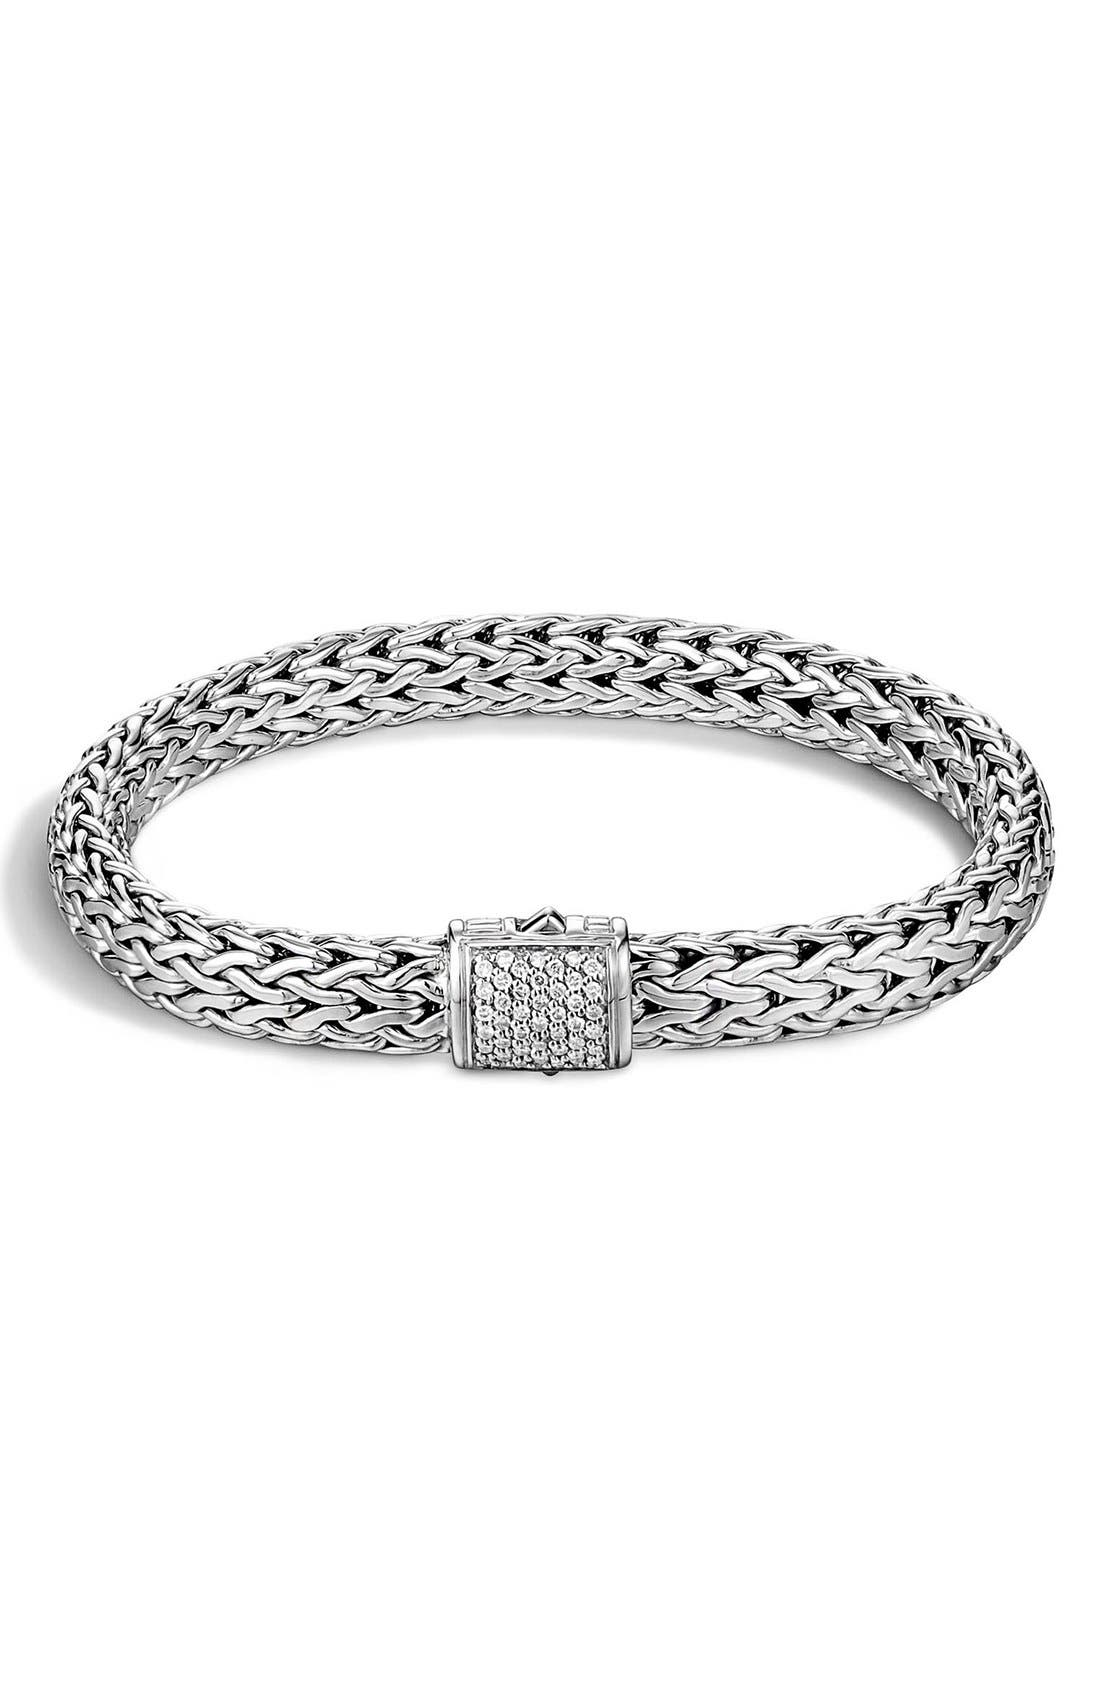 Classic Chain 7.5mm Diamond Bracelet,                             Main thumbnail 1, color,                             SILVER